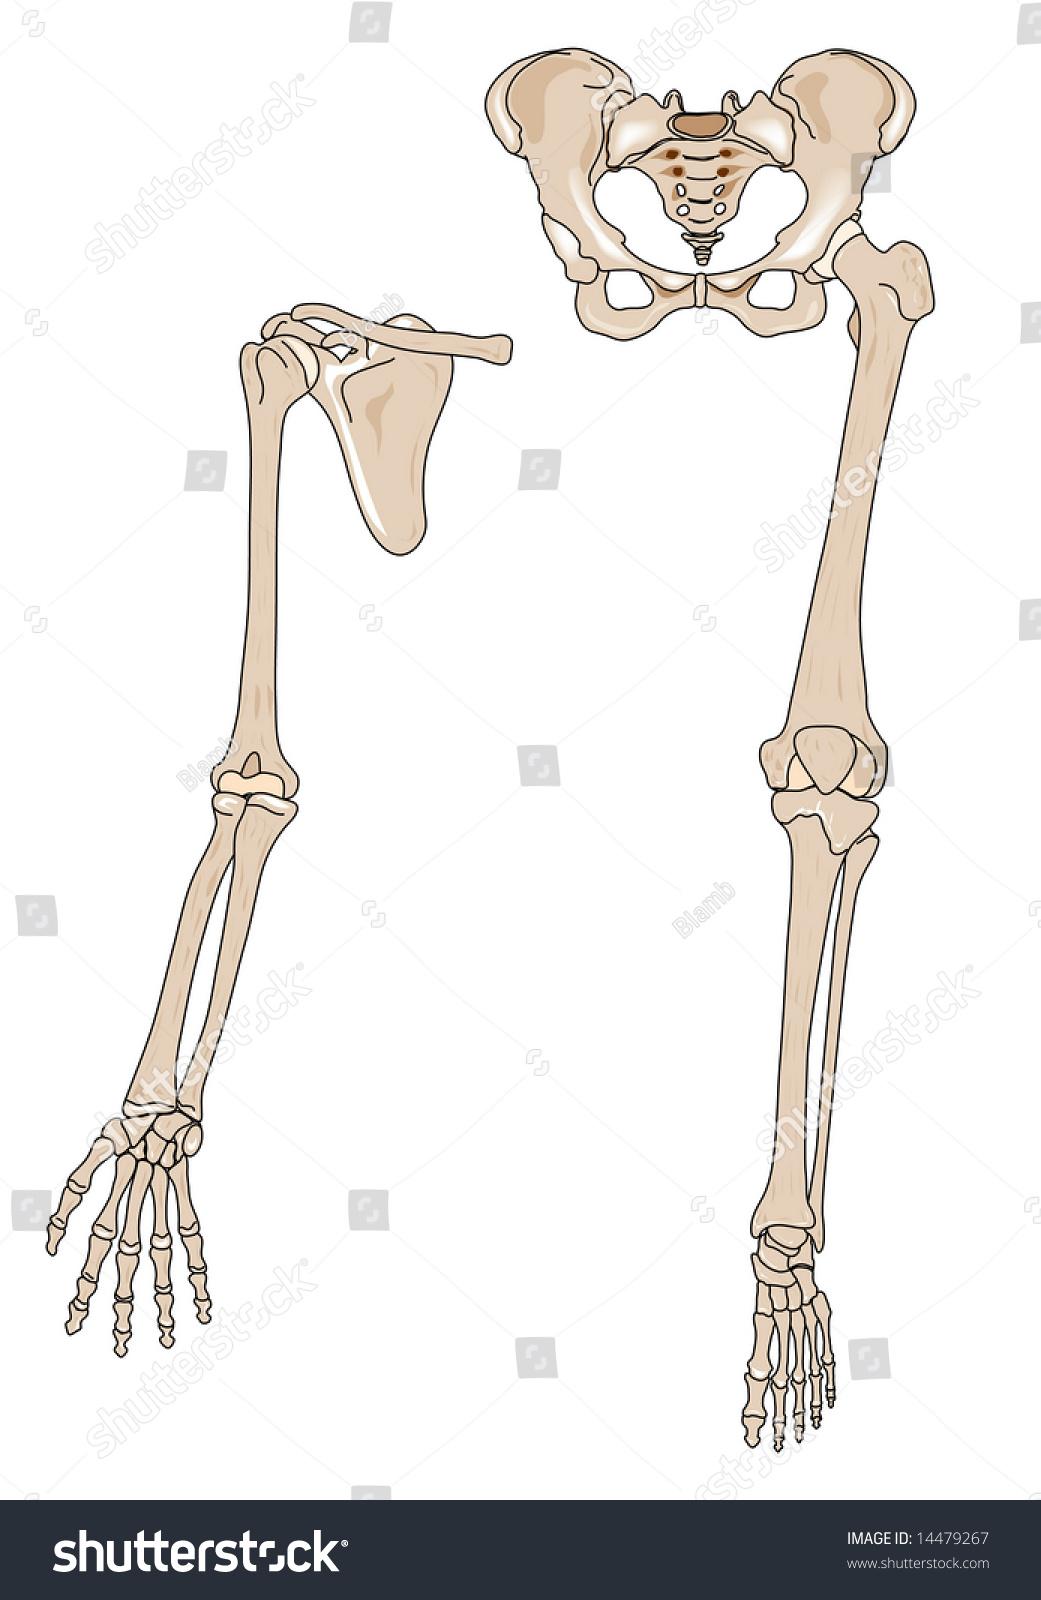 Human Arm Leg Bones Stock Illustration Royalty Free Stock